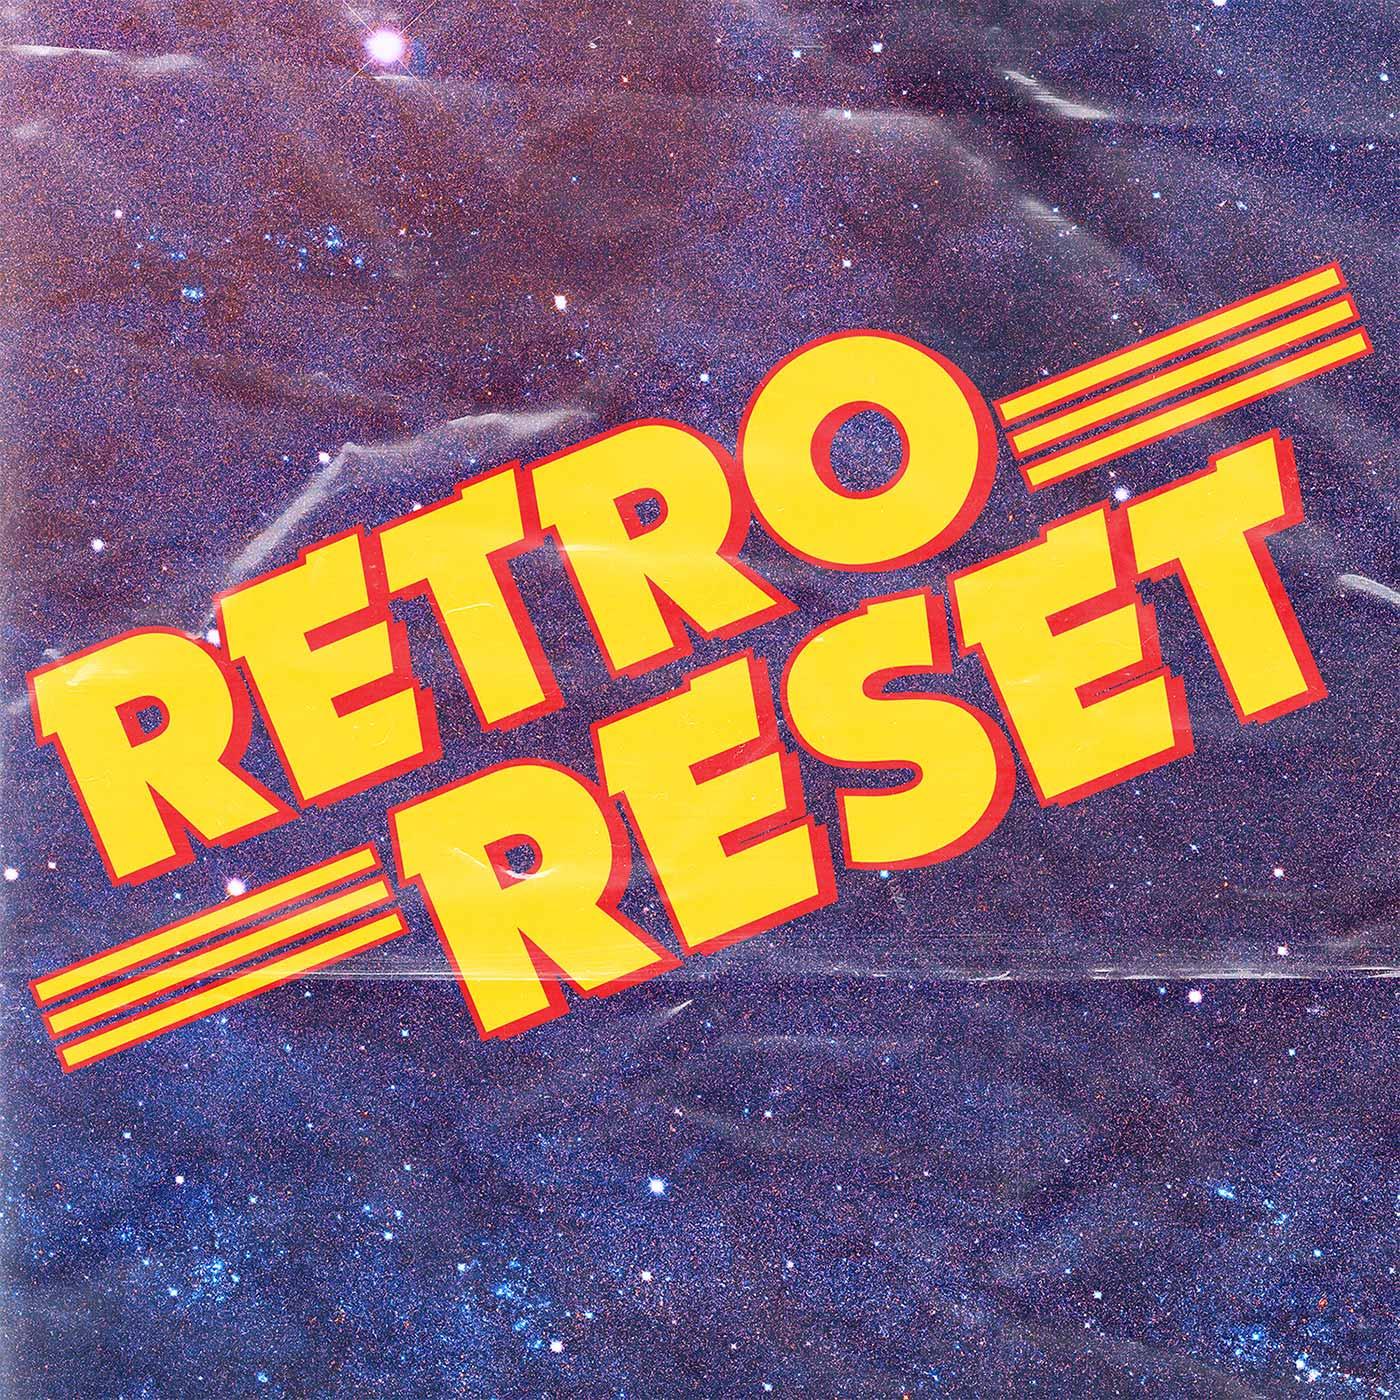 Retro Reset show art